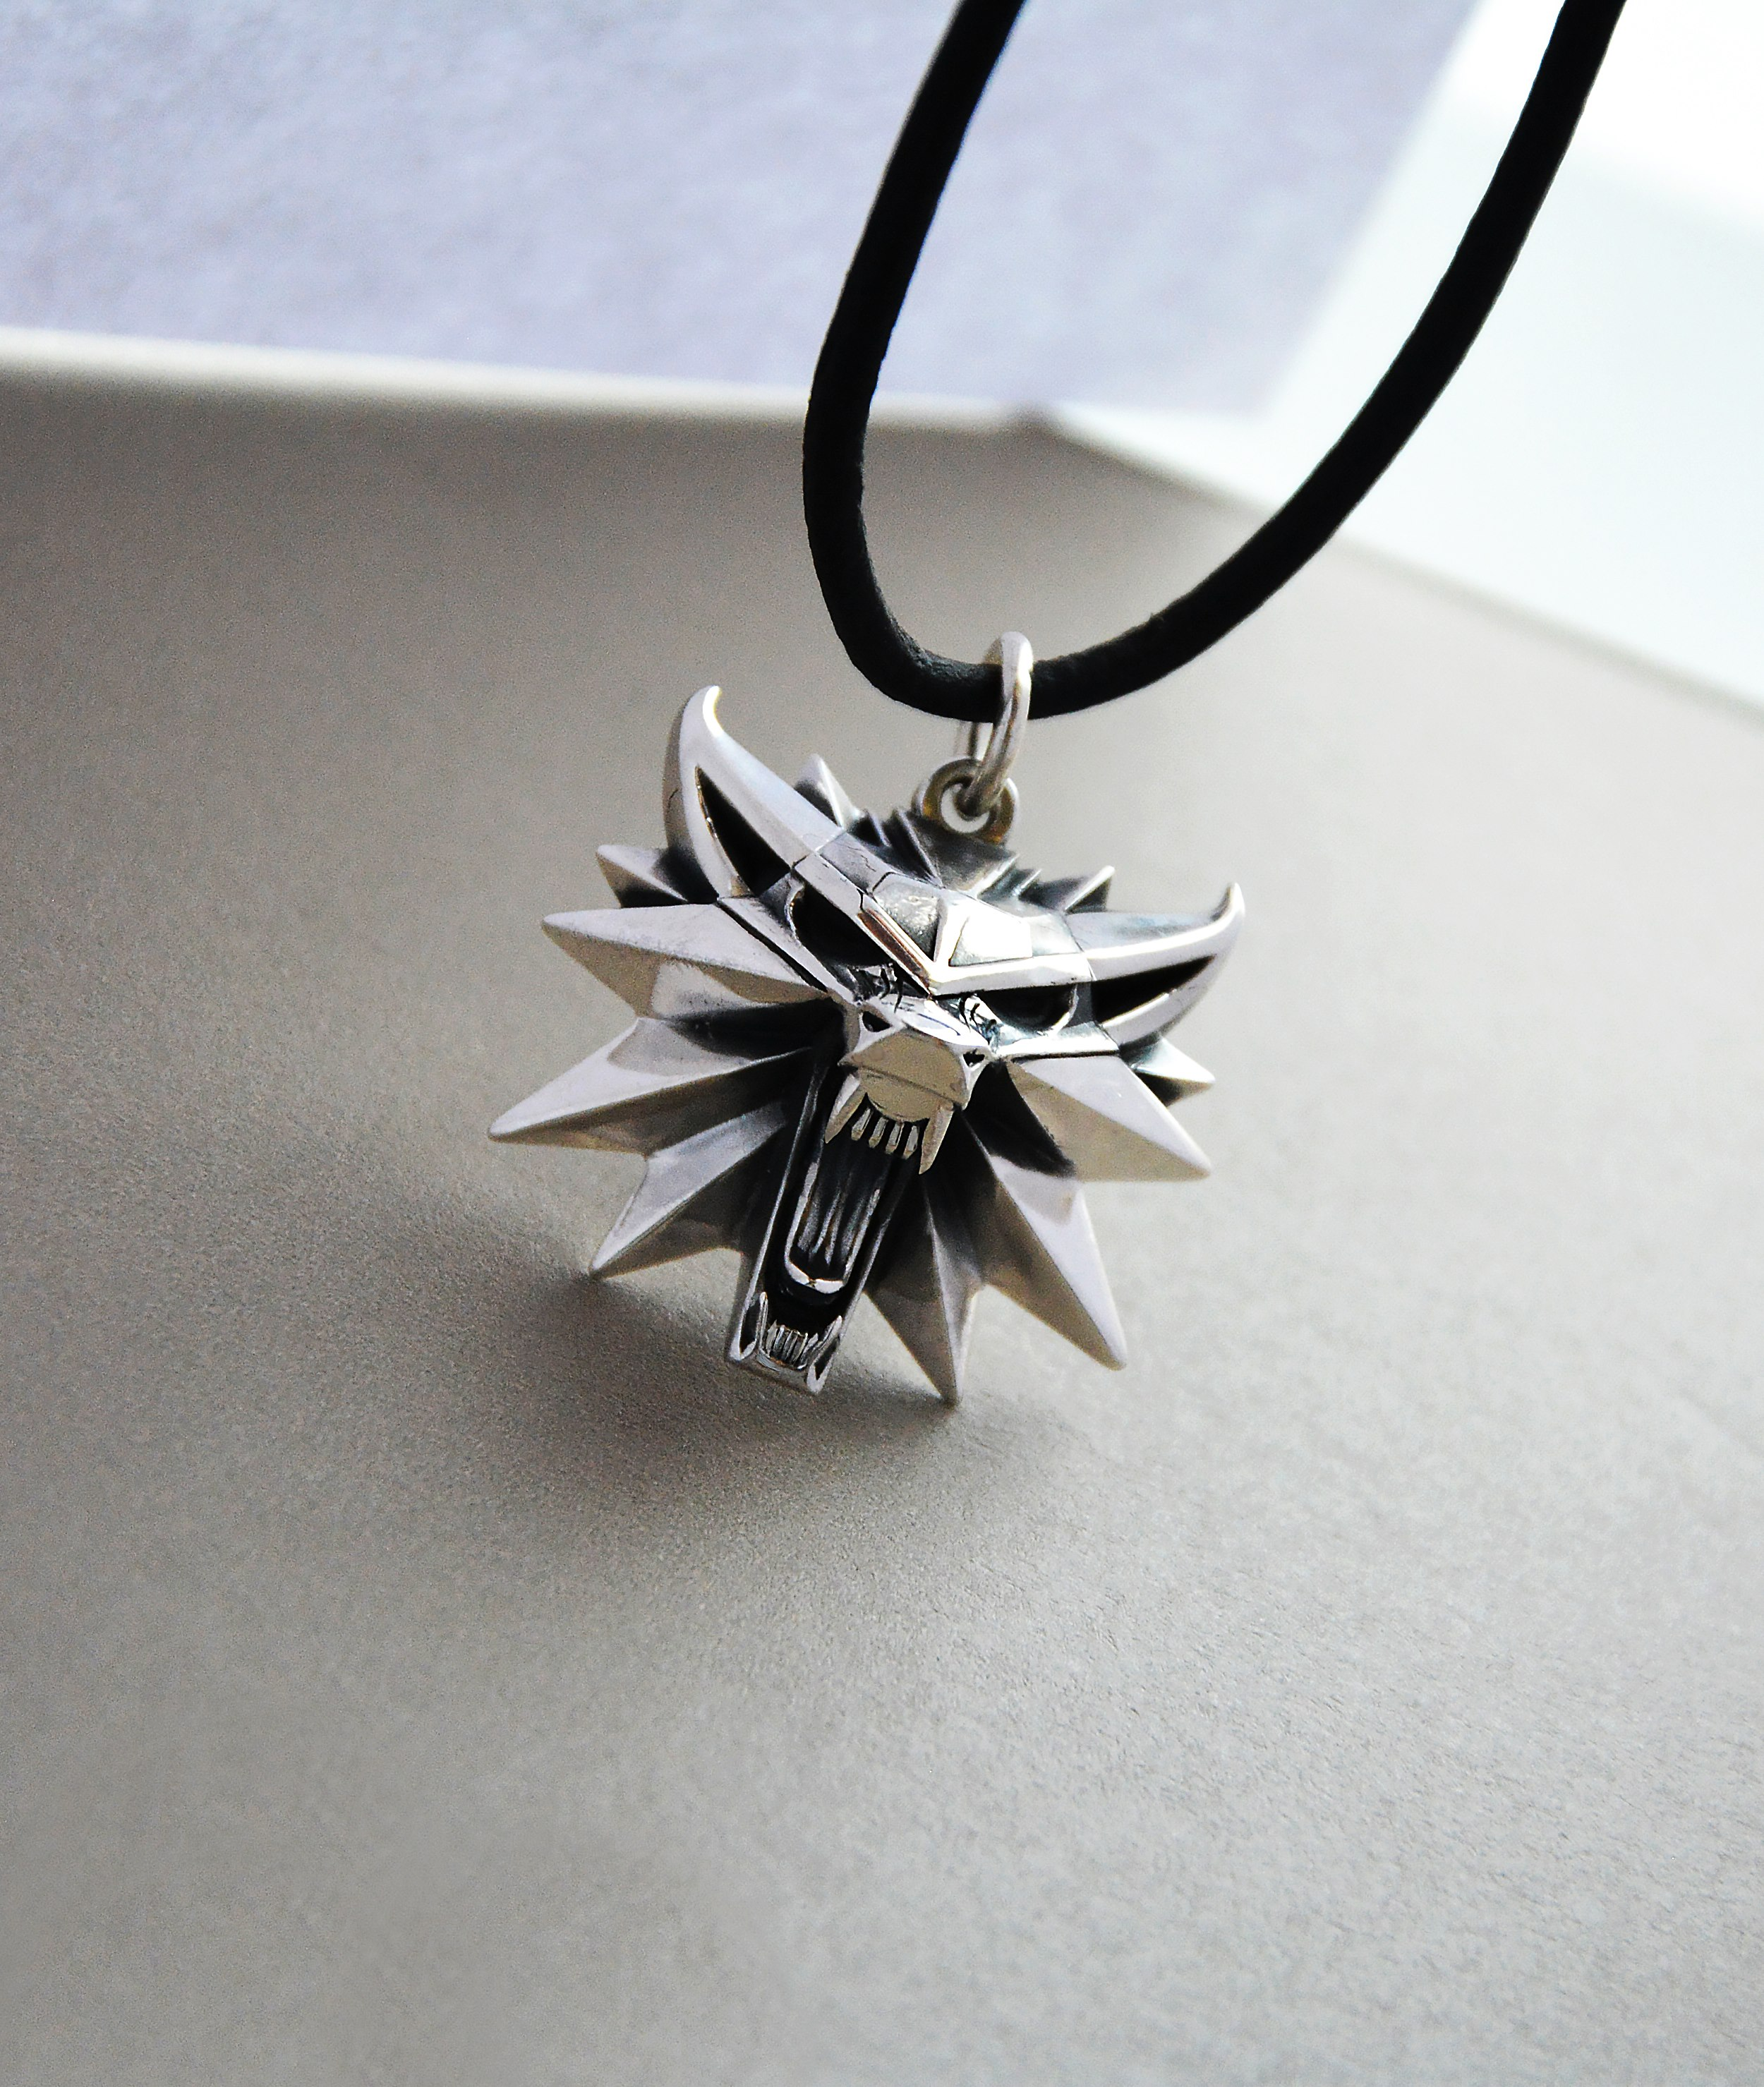 gemer jewelry worldofjewelcraf14123